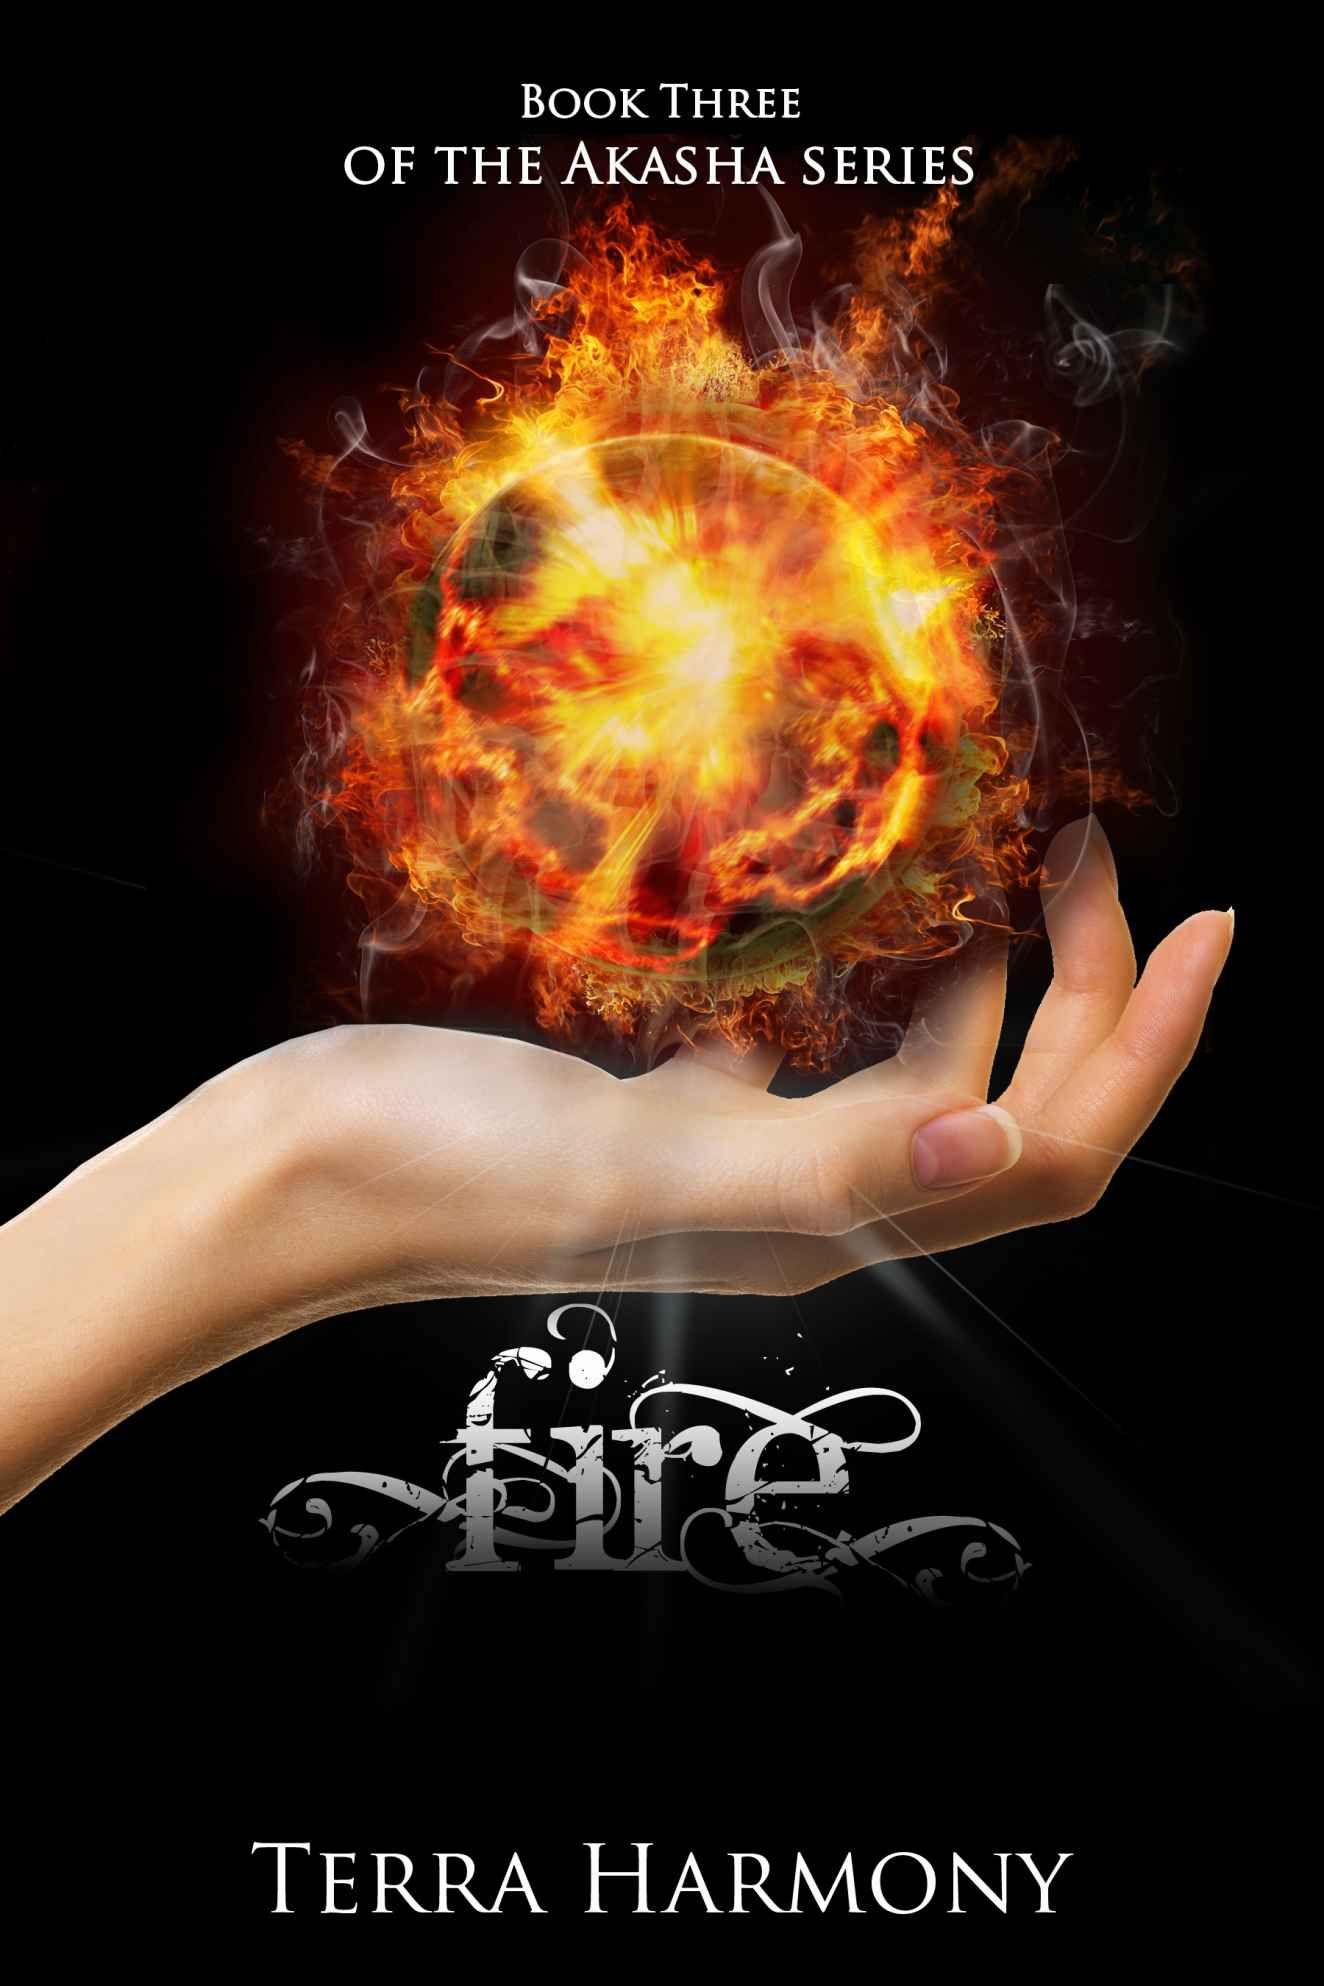 Amazon: Fire (the Akasha Series) Ebook: Terra Harmony: Kindle